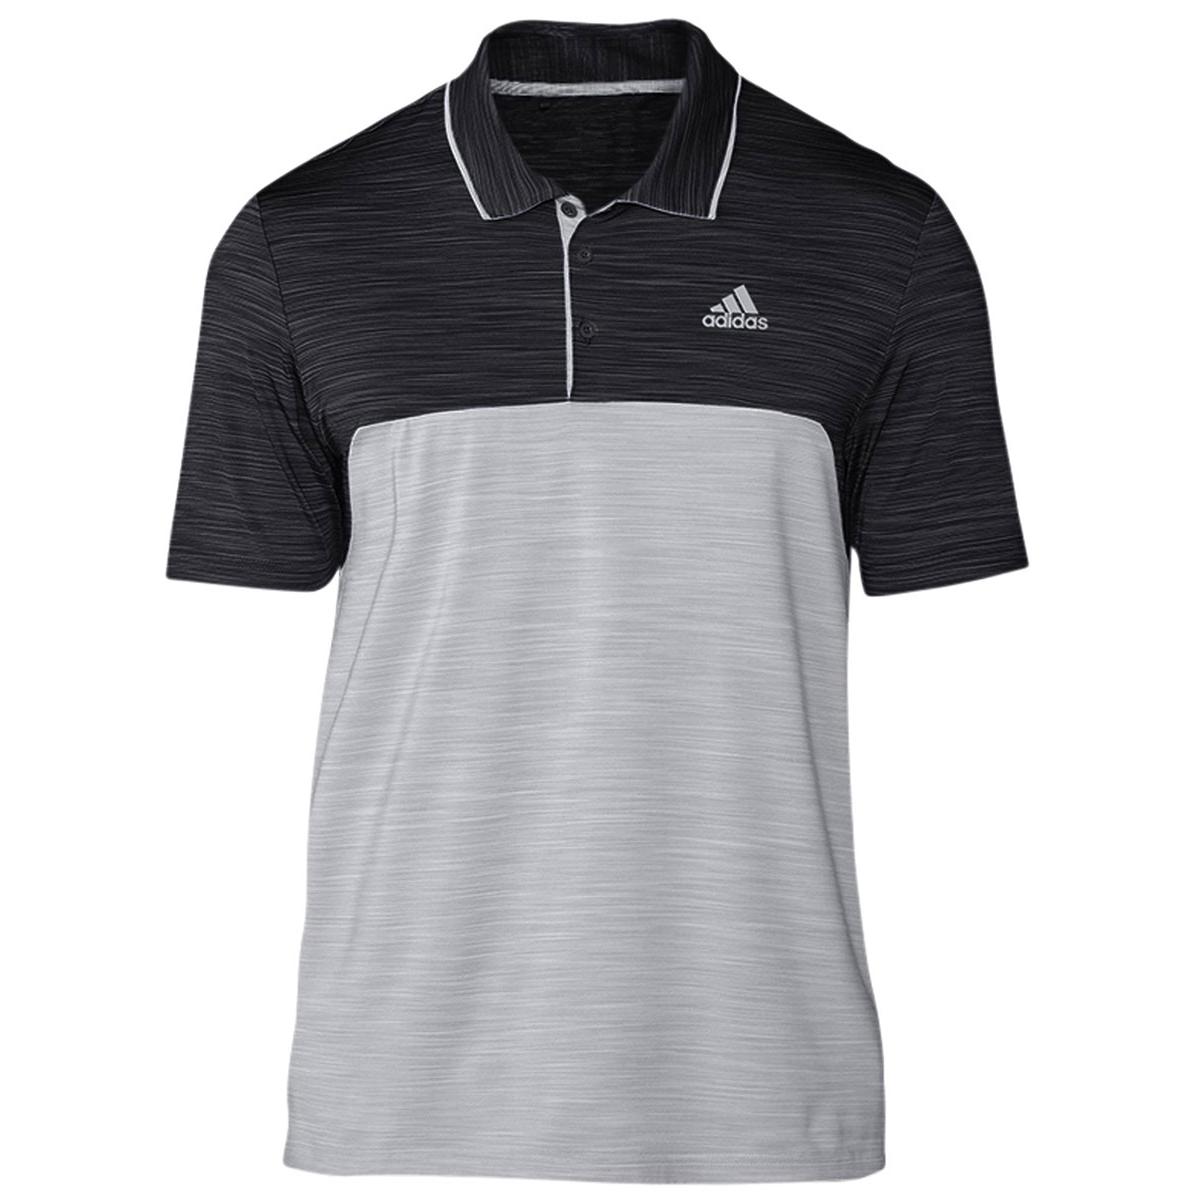 best website 2a281 2809d Adidas Polo Ult 365 Heather W8 ...